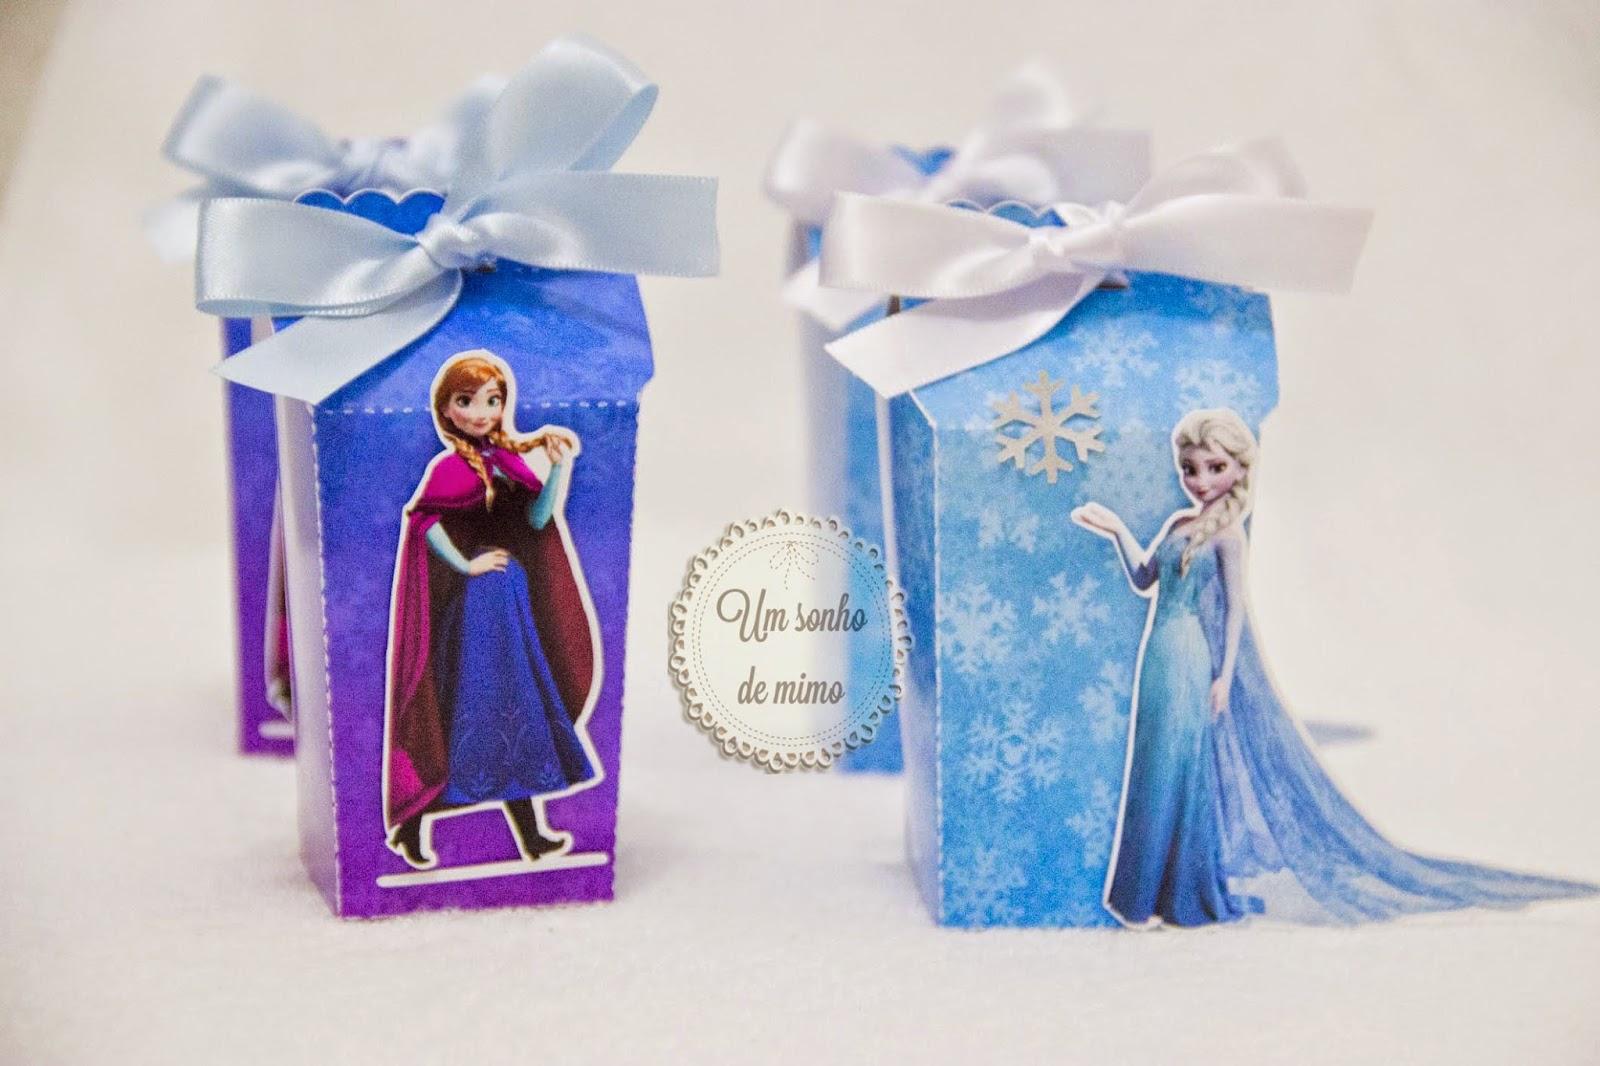 personalizados Frozen, festa frozen, Frozen, Frozen BH, Caixa personalizada Frozen